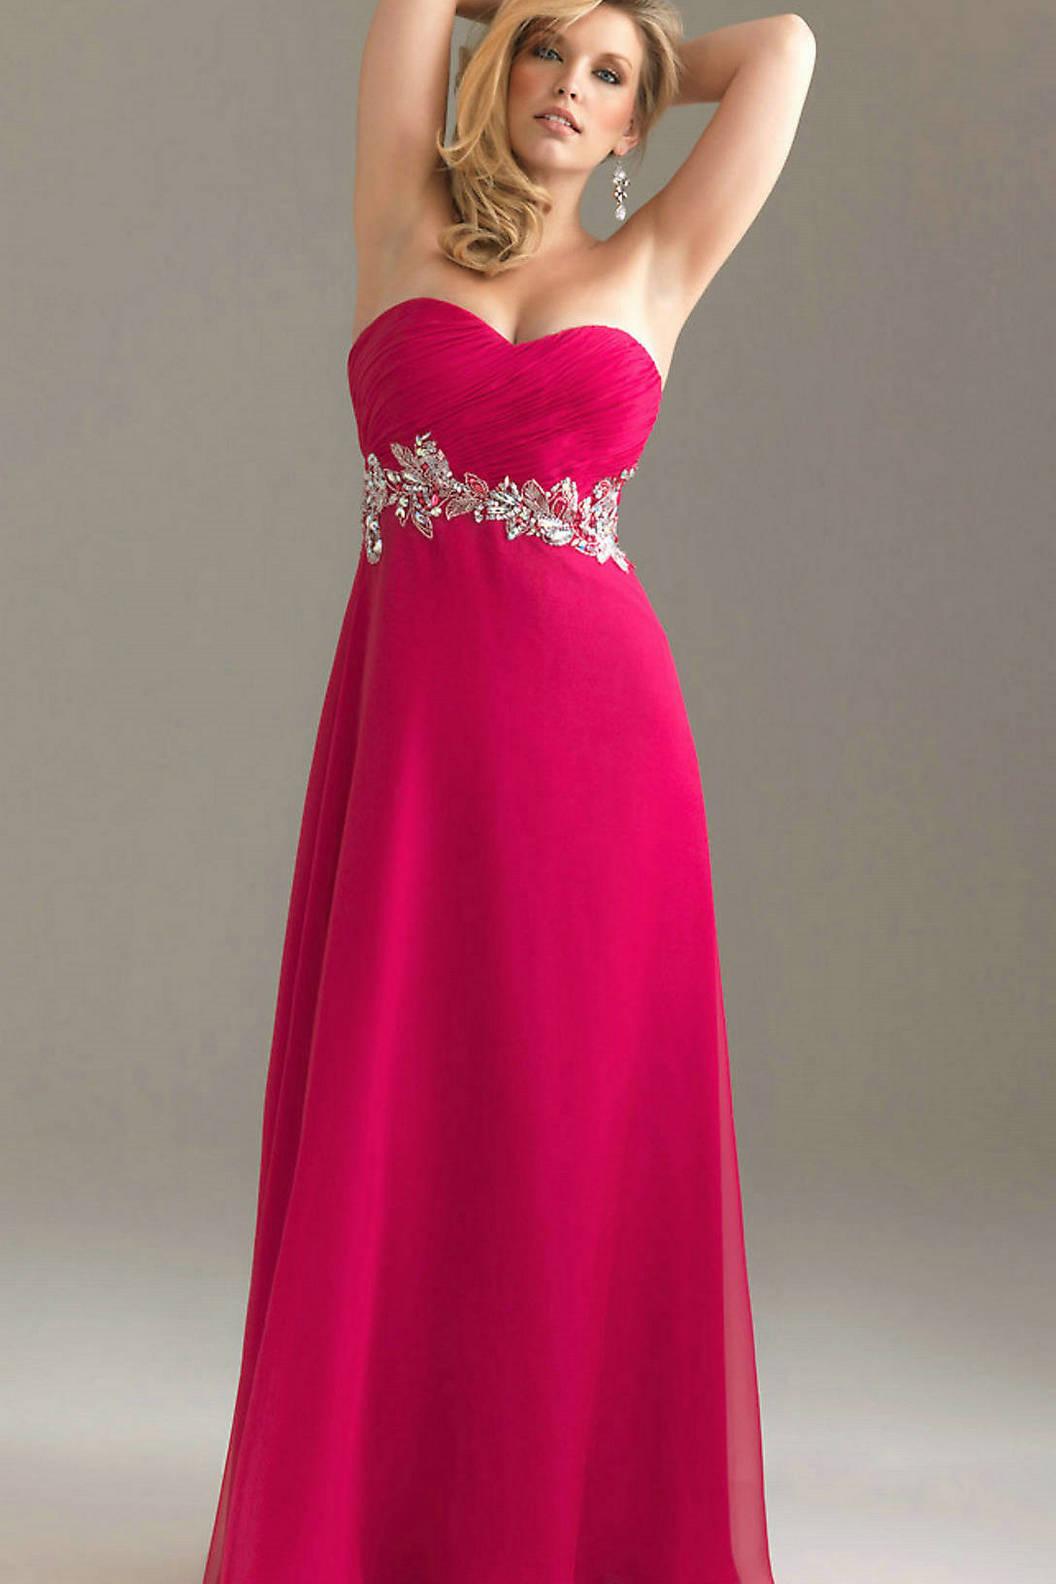 865a24da4ca Plus Size Prom Dresses 2015 Dillards - Gomes Weine AG